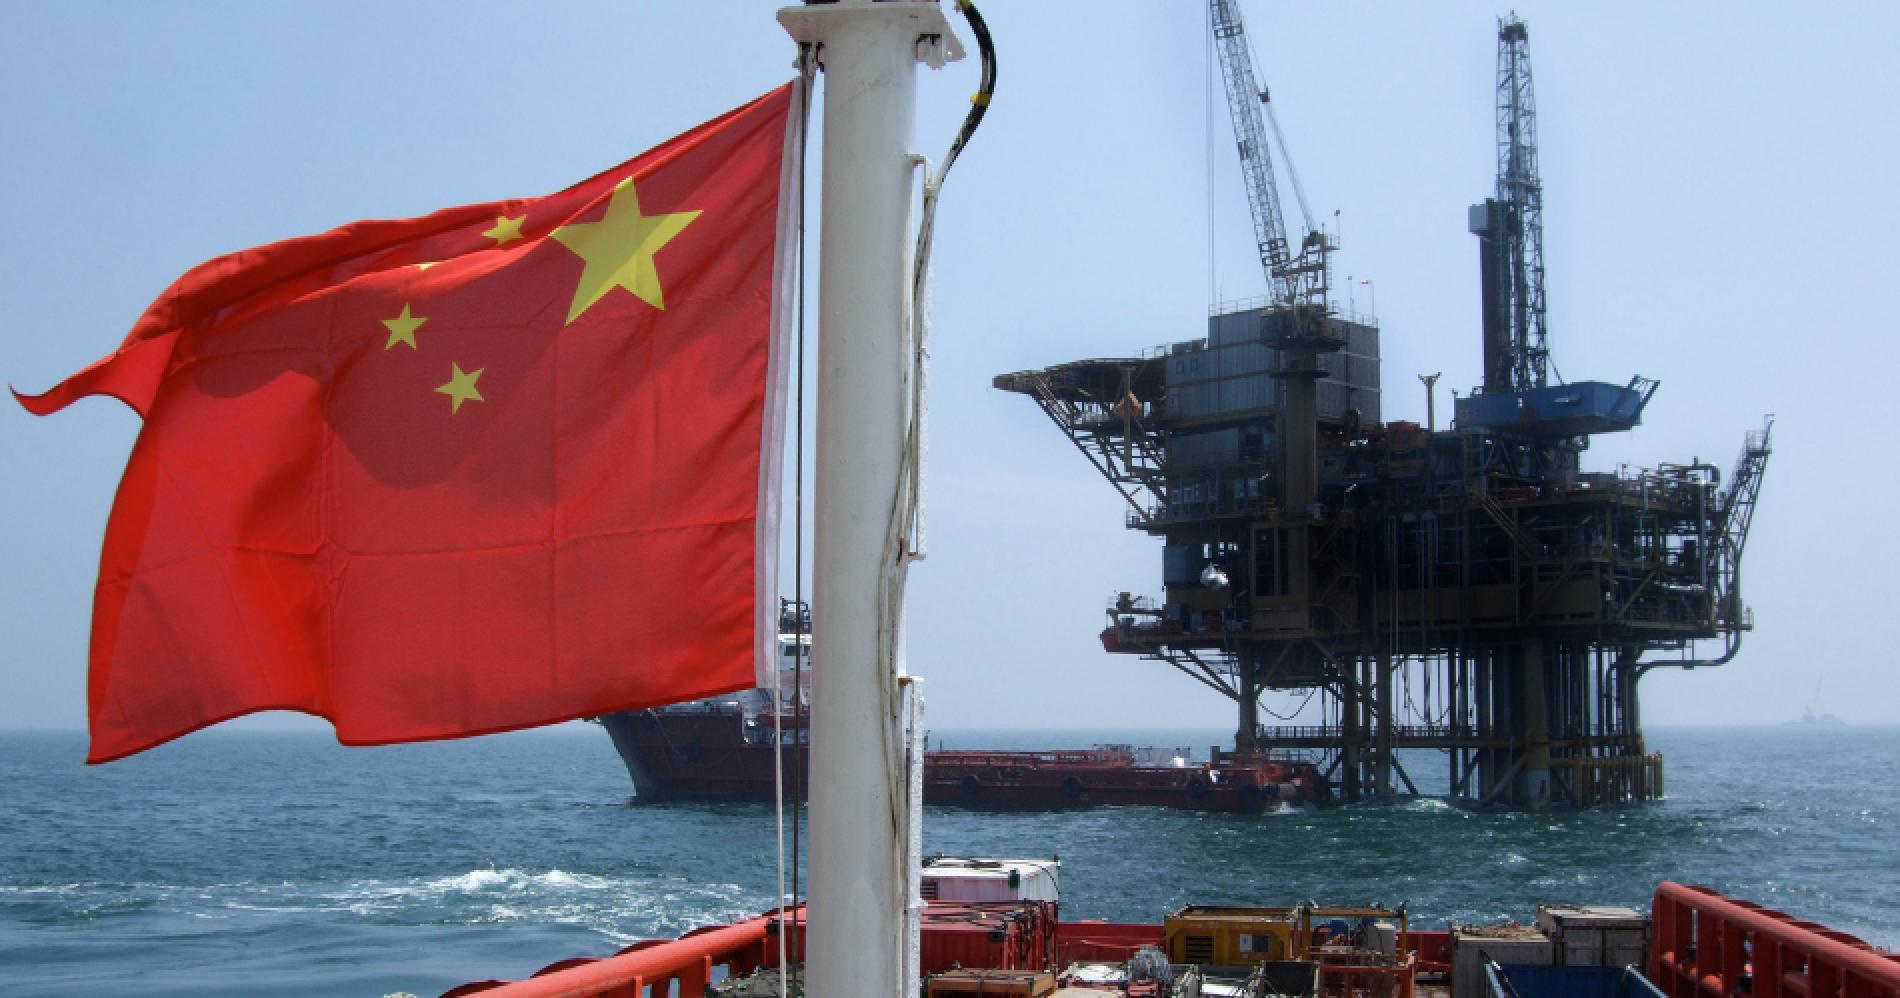 China Oil Illustration Web Bisnis Muda - Canva